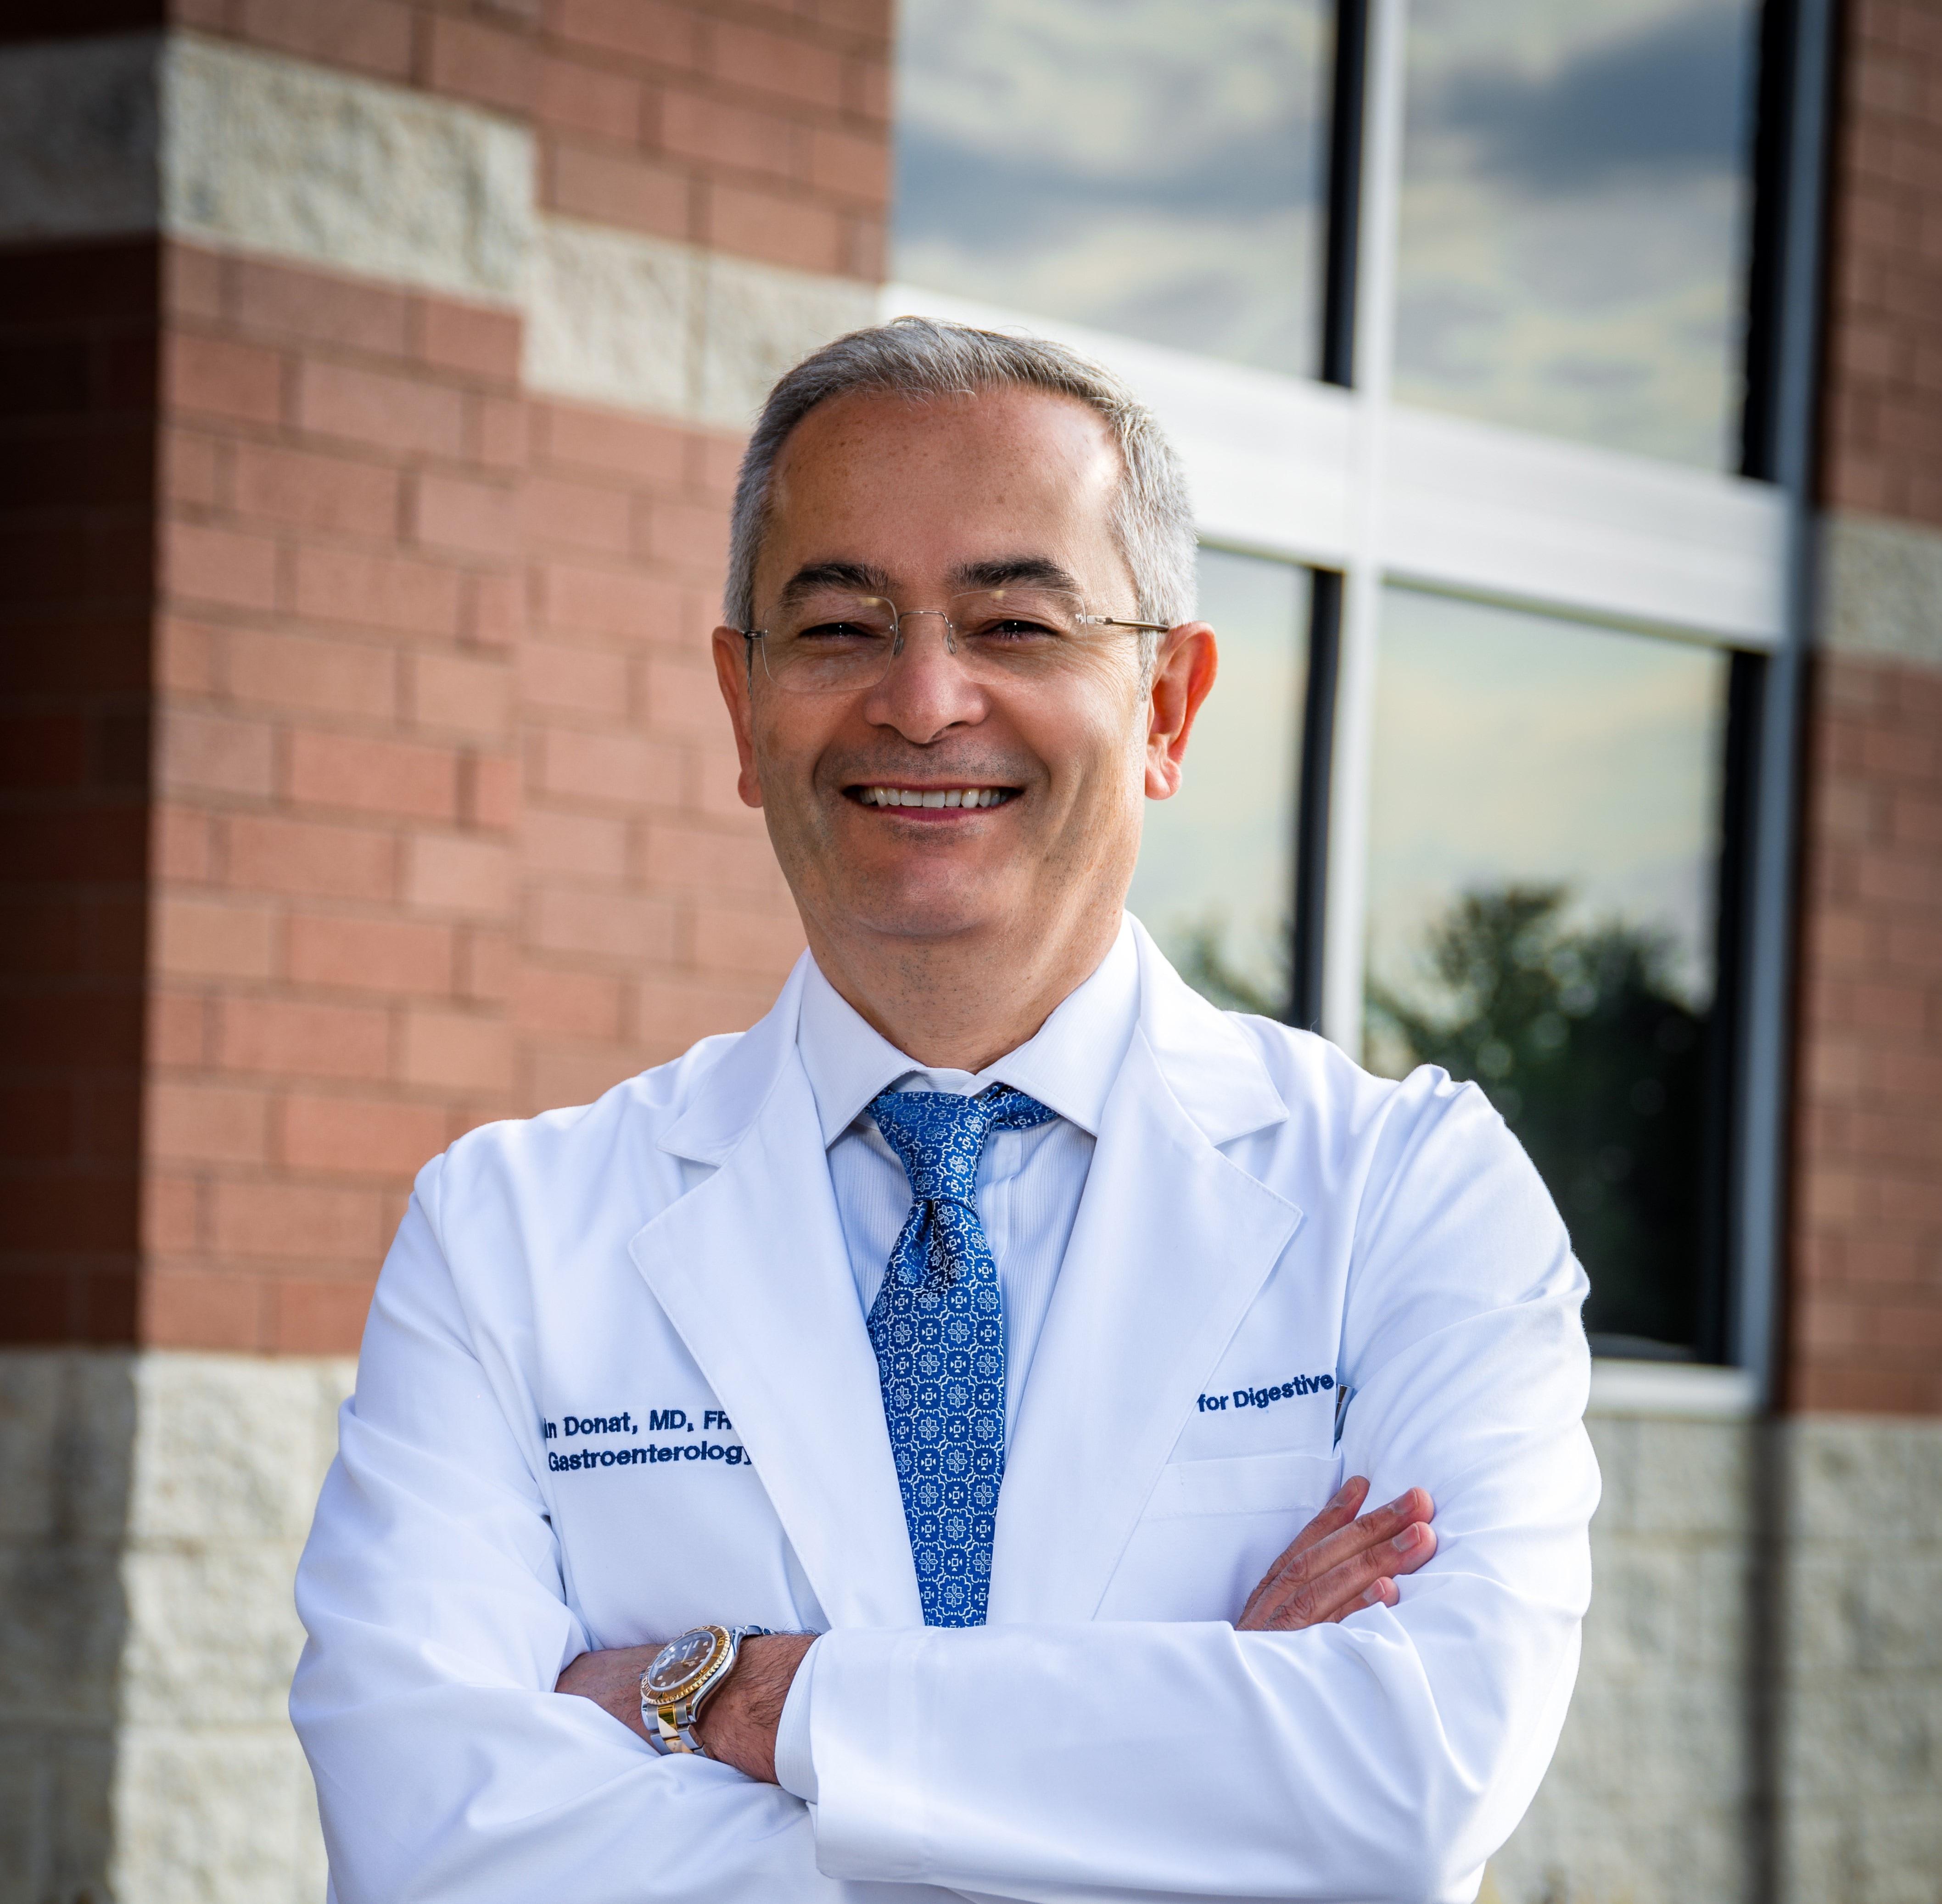 Dr. Mehmet E Donat MD